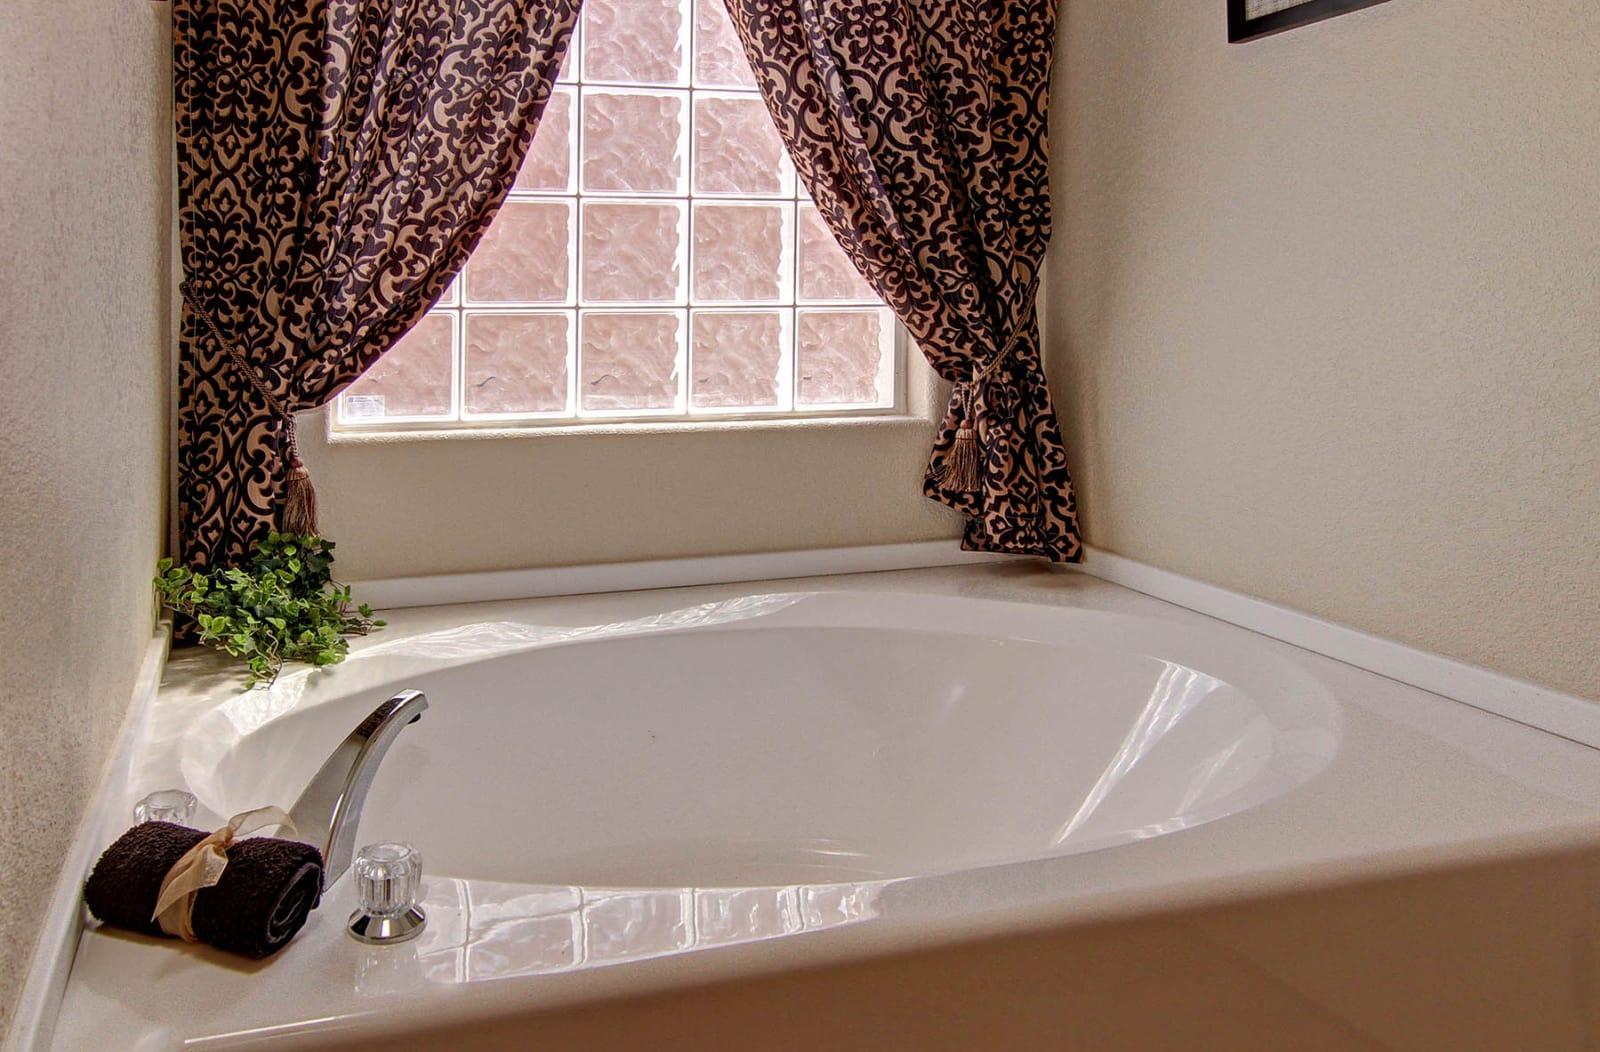 Unusual Sunrise Tubs Ideas - Bathtub for Bathroom Ideas - lulacon.com